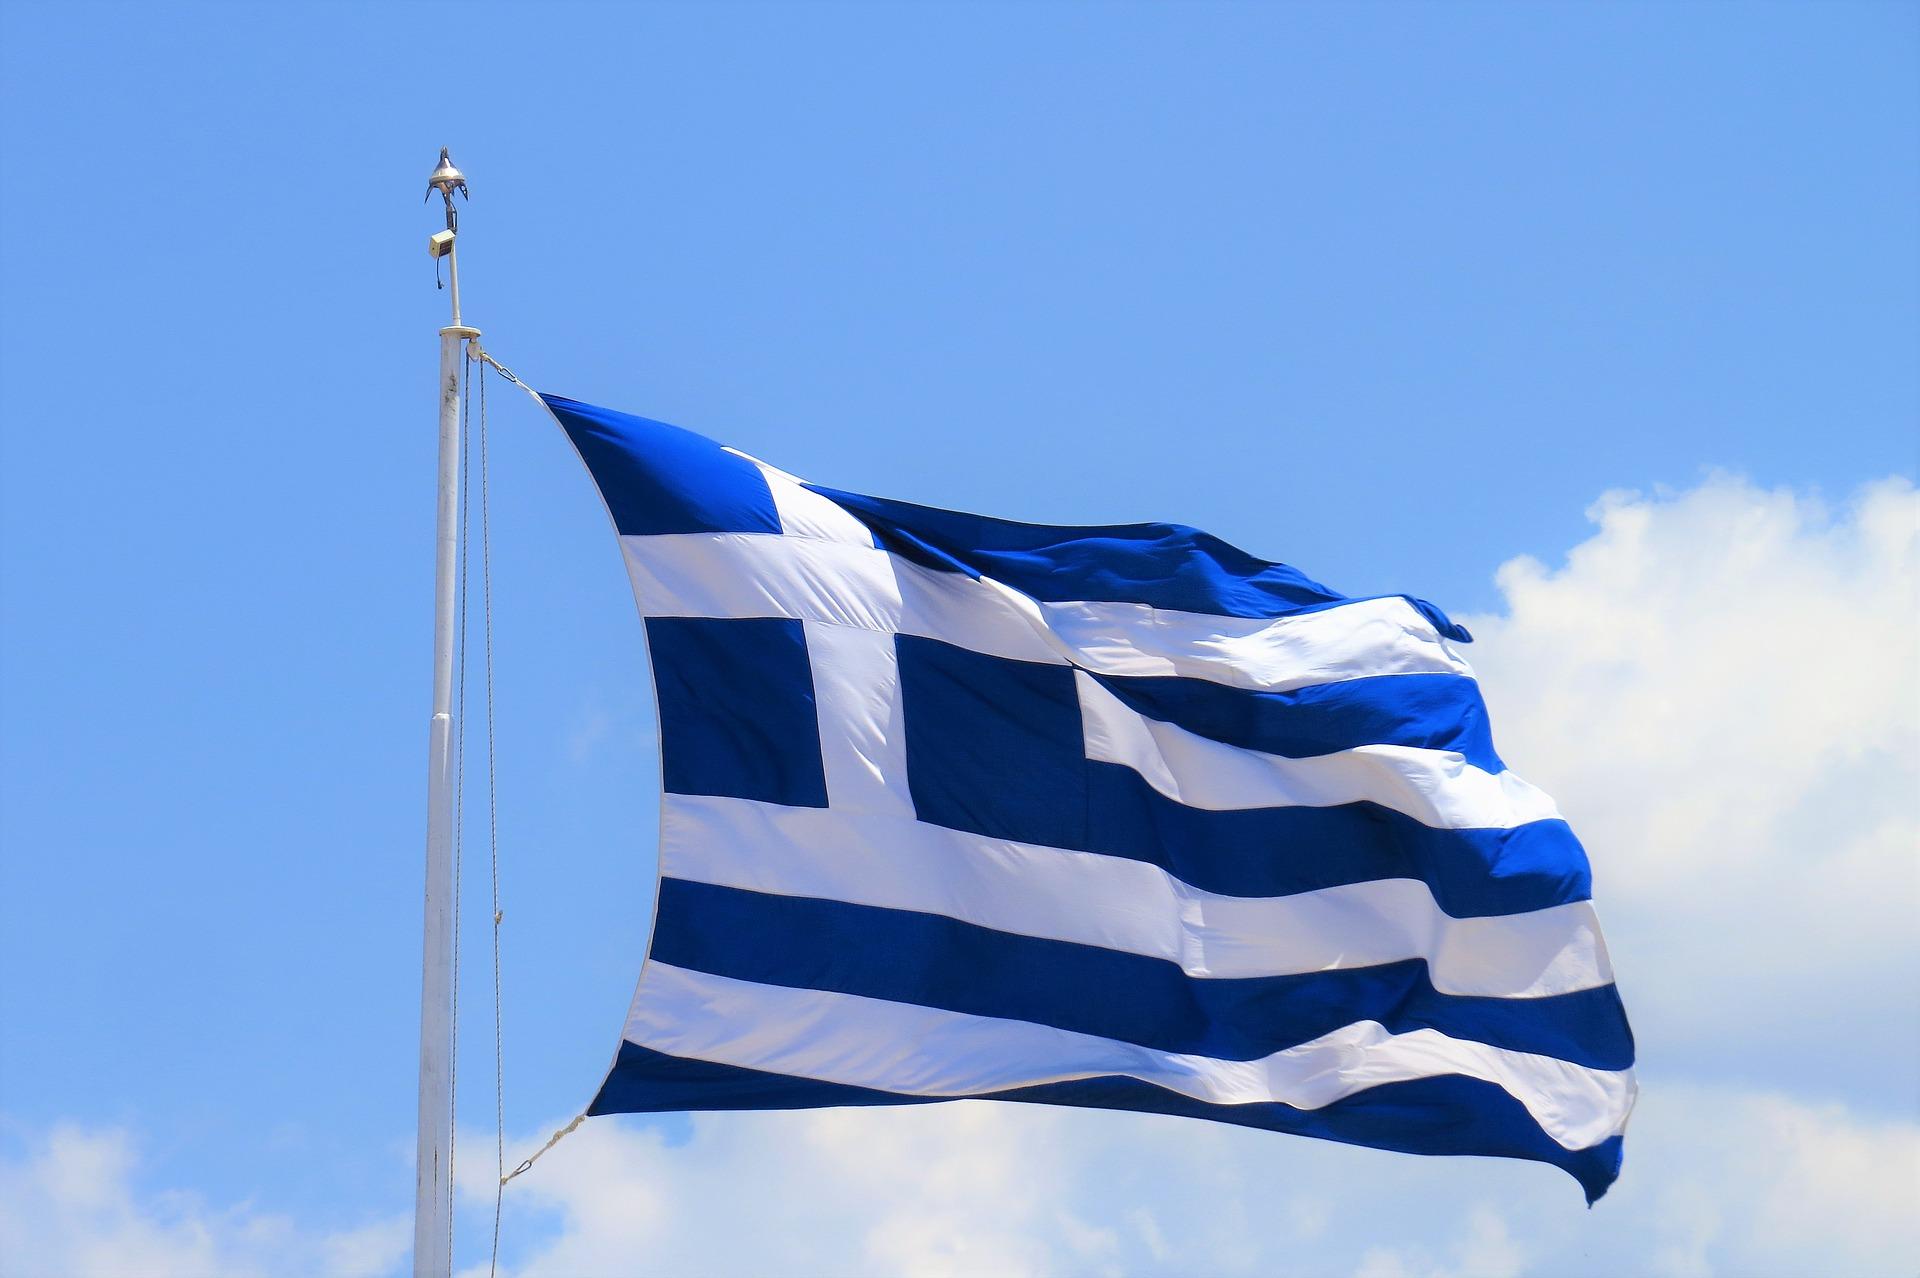 AİHM Batı Trakyalı kadının miras davasında Yunanistan'ı haksız buldu